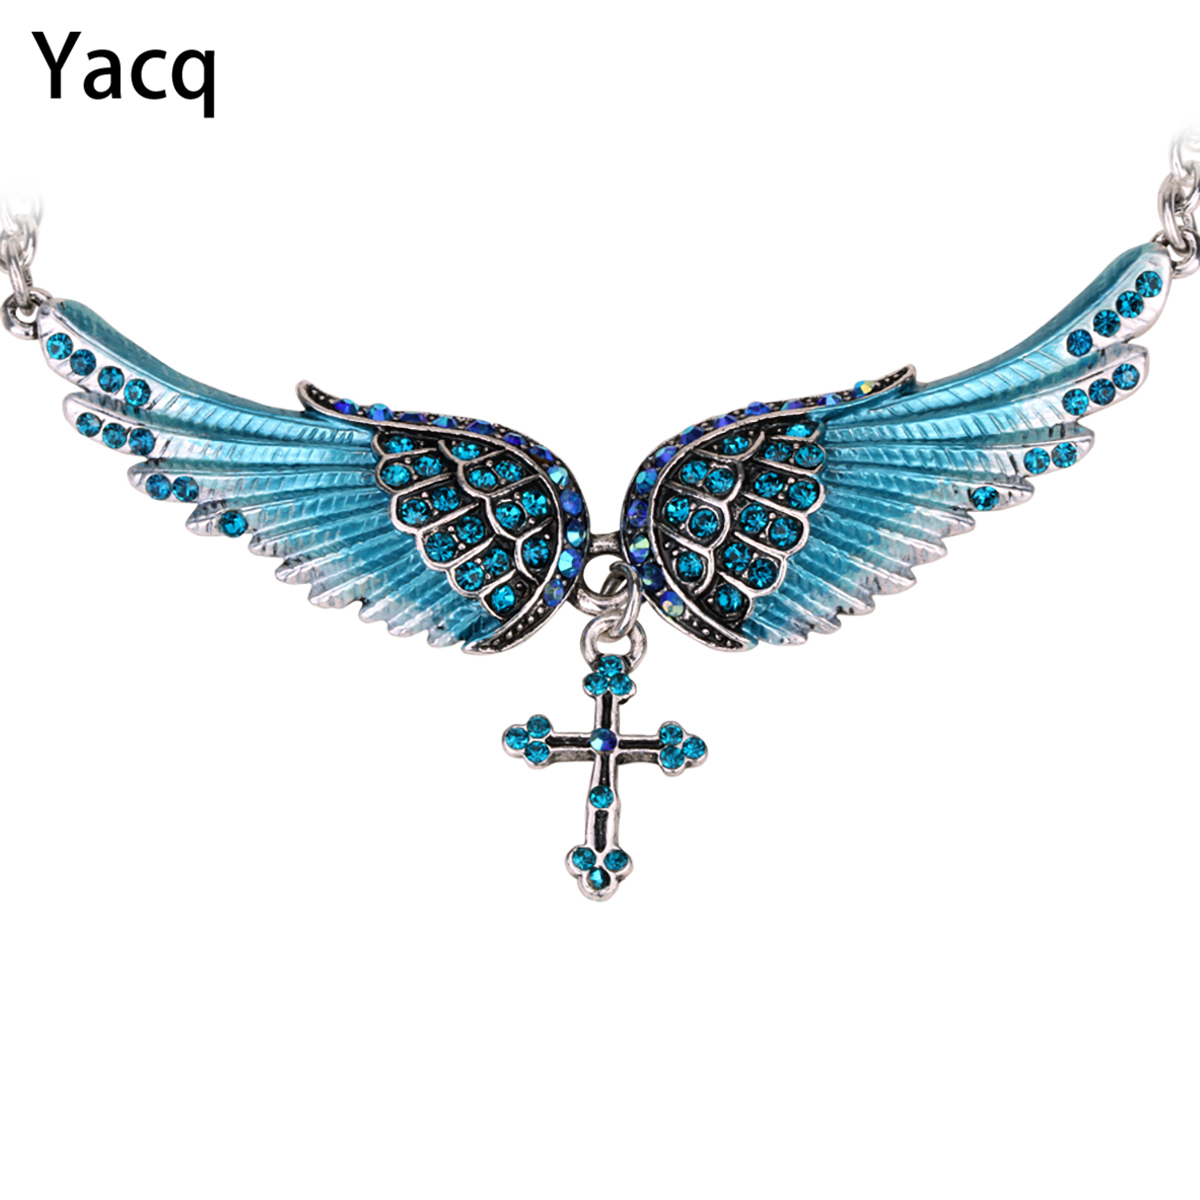 YACQ Angel Wing Cross Choker Necklace Guardian Women Biker Crystal Jewelry Gifts Her Girl Silver Color NC01 Dropshipping (18+2)